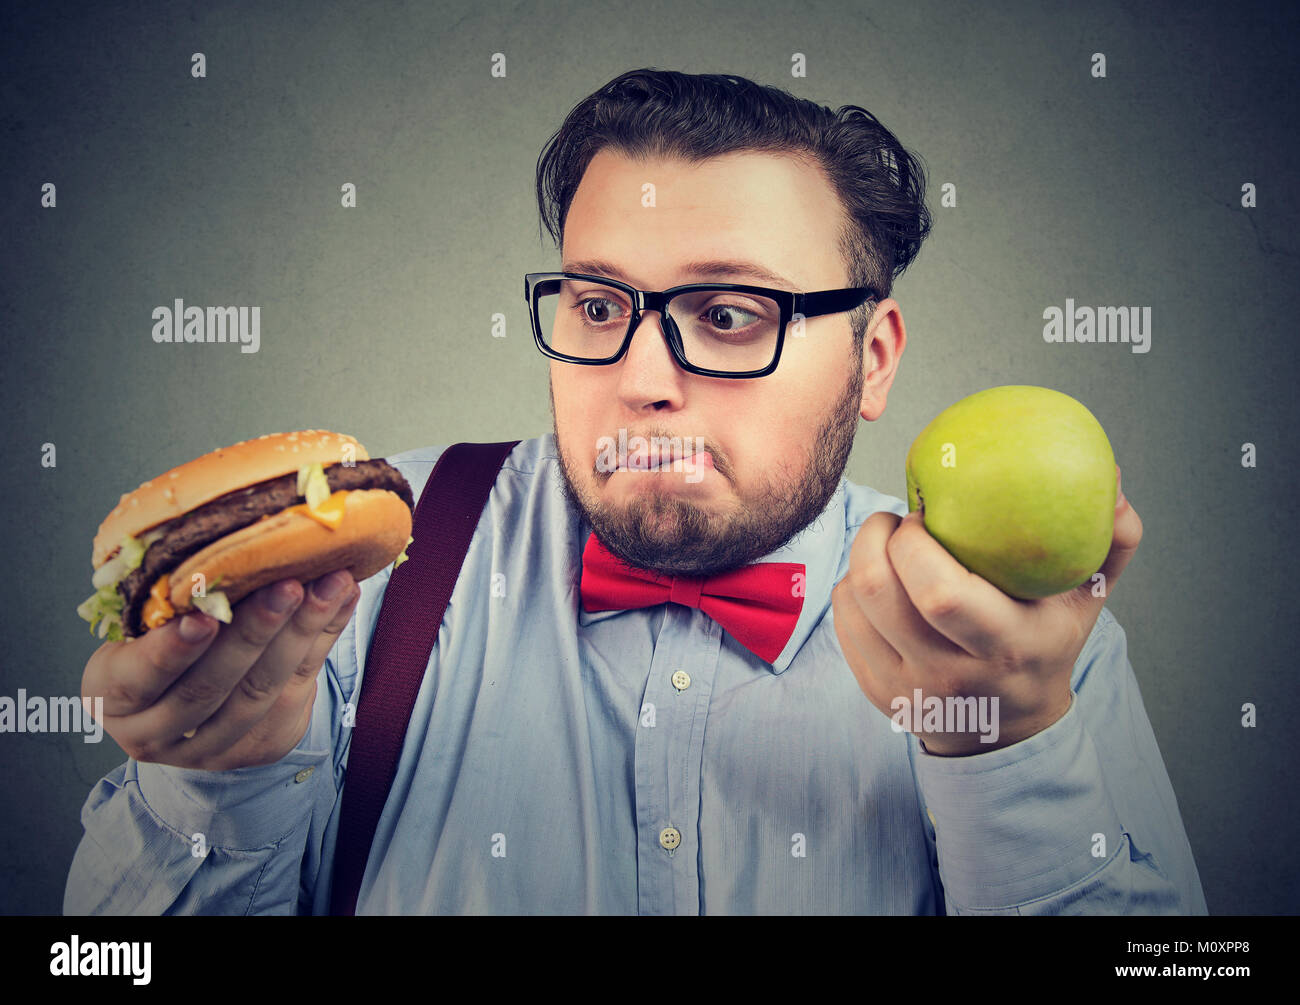 Mollig Mann in Brillen craving leckere Burger statt grün Apple verwirrt. Stockbild